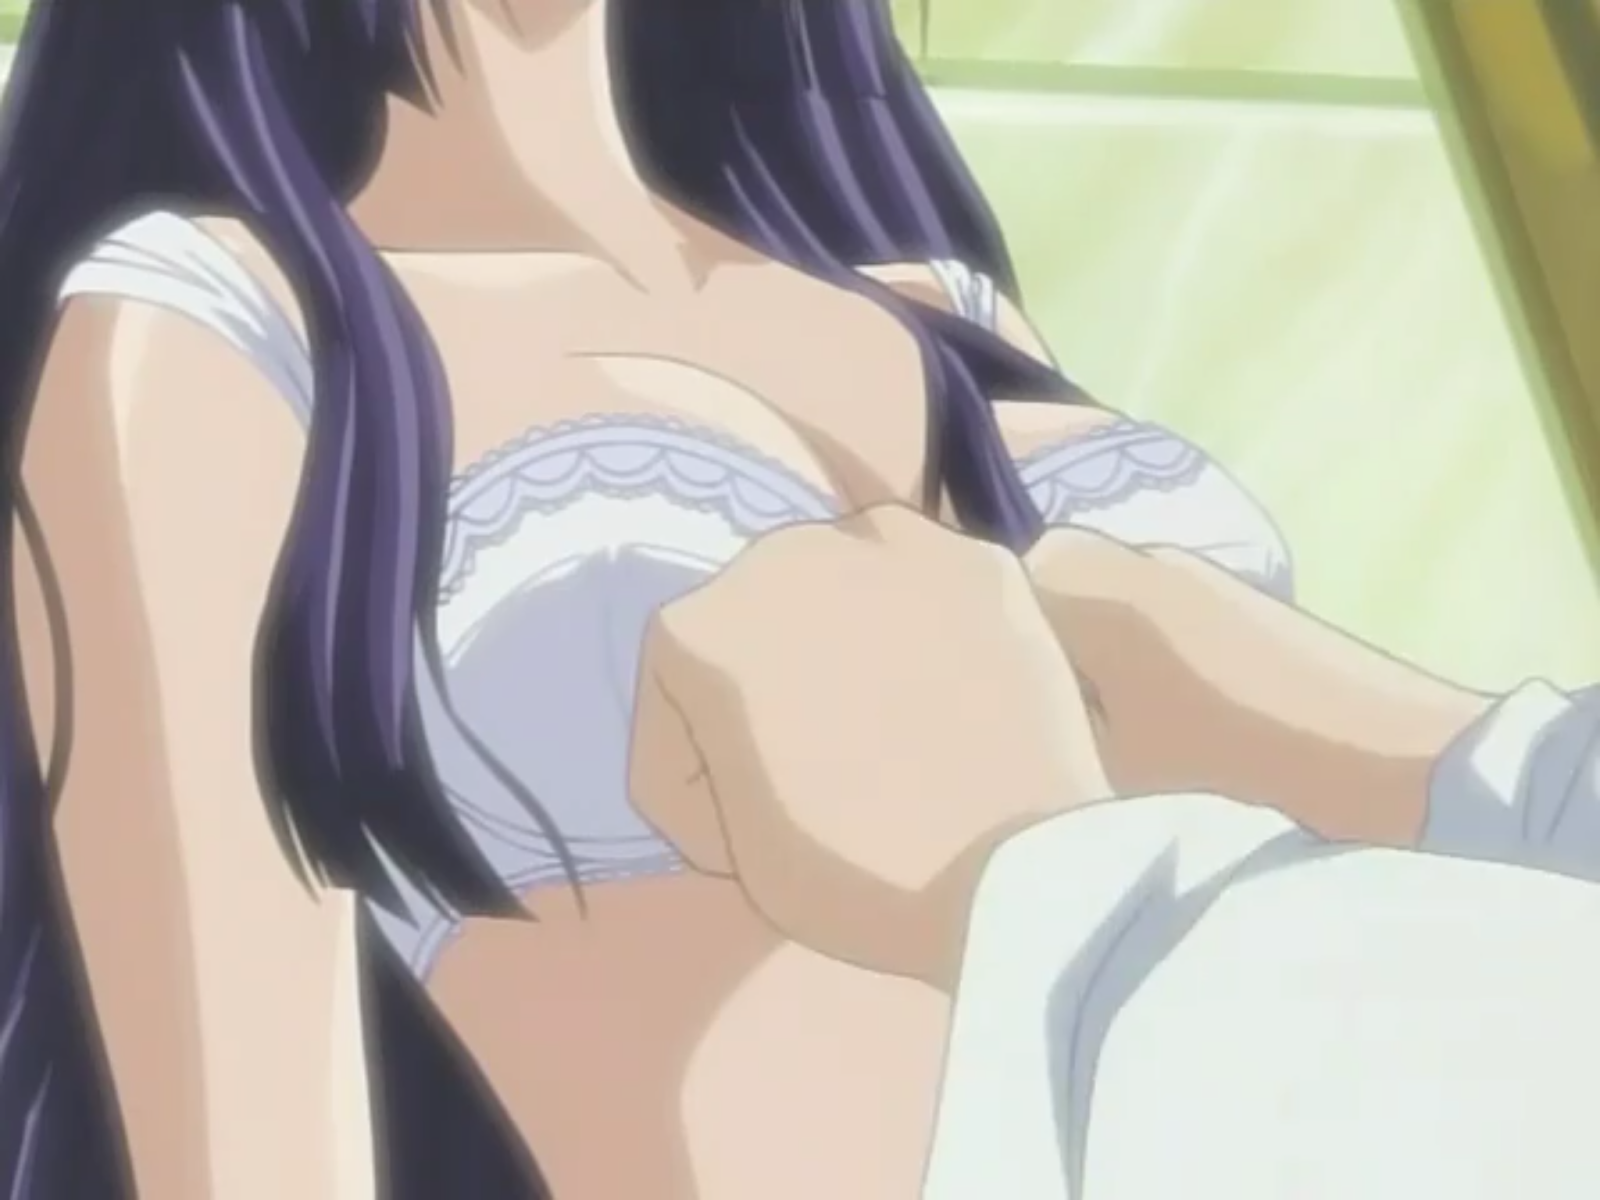 Moonlightlady hentai sex video Pretty girls